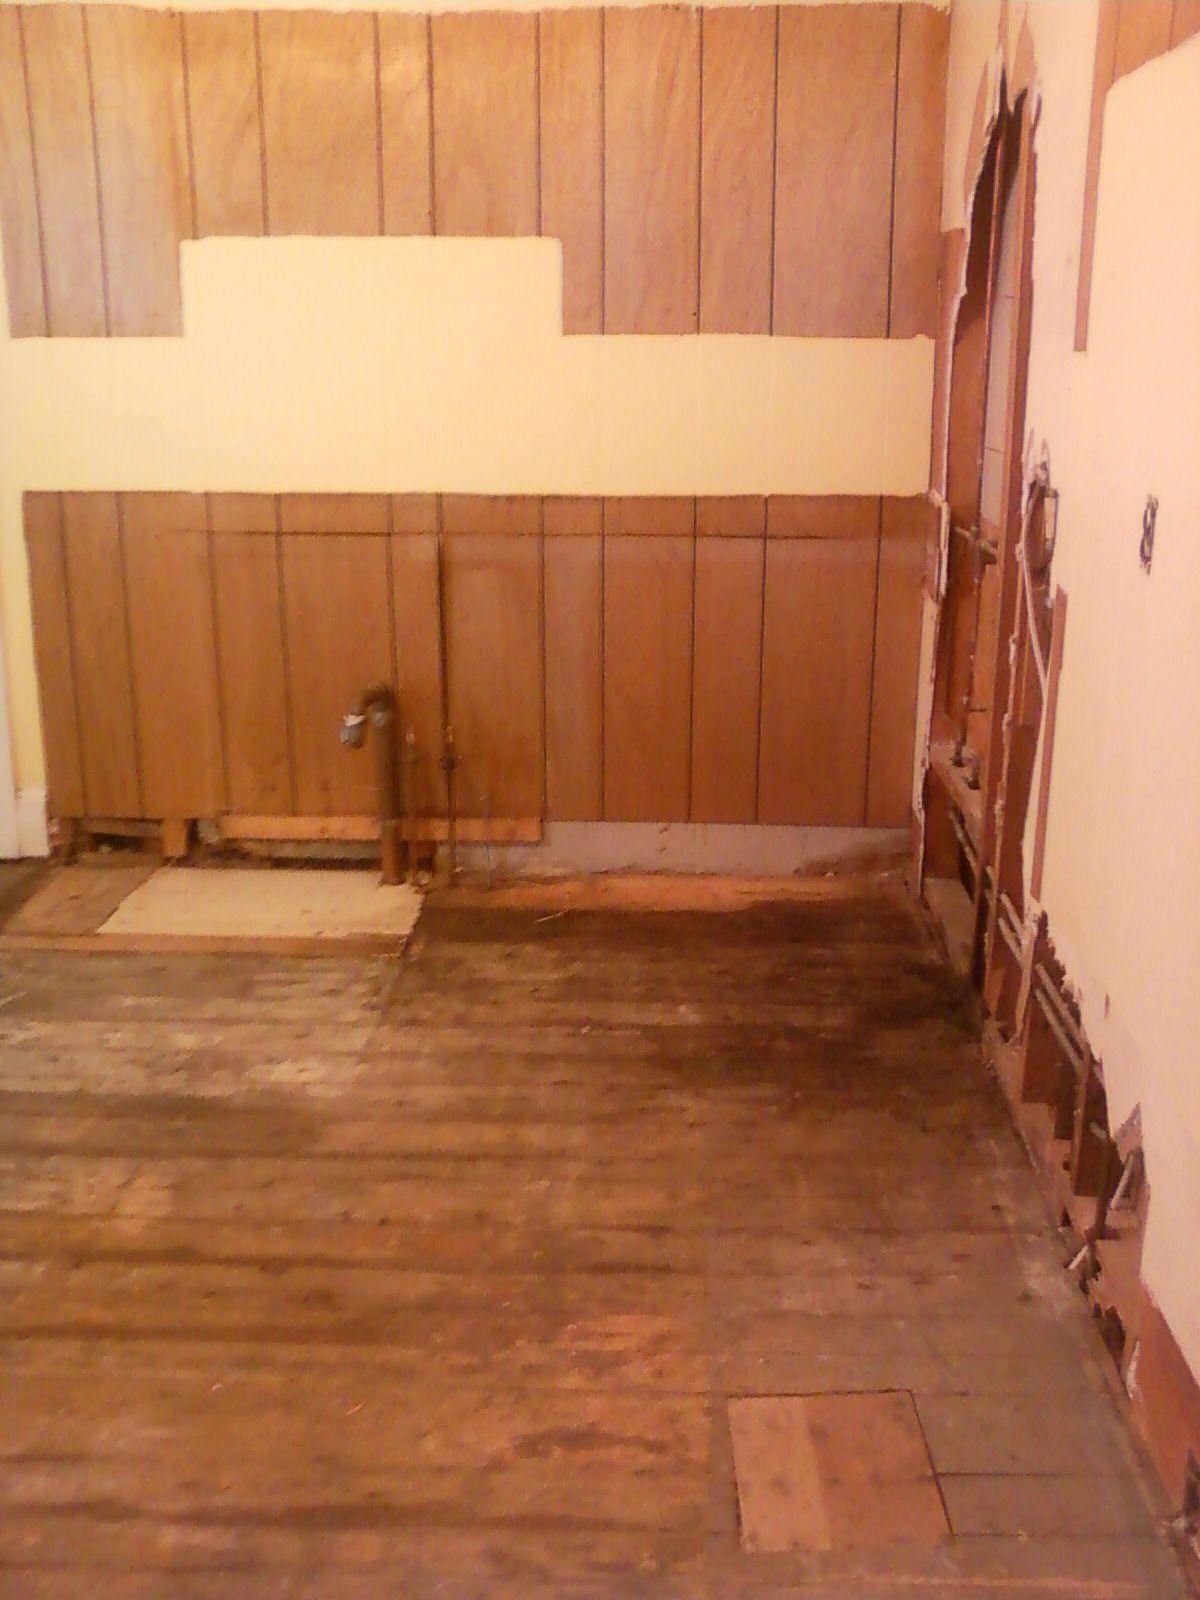 Mdb Construction Home Flooring Water Damage Repair Remodel